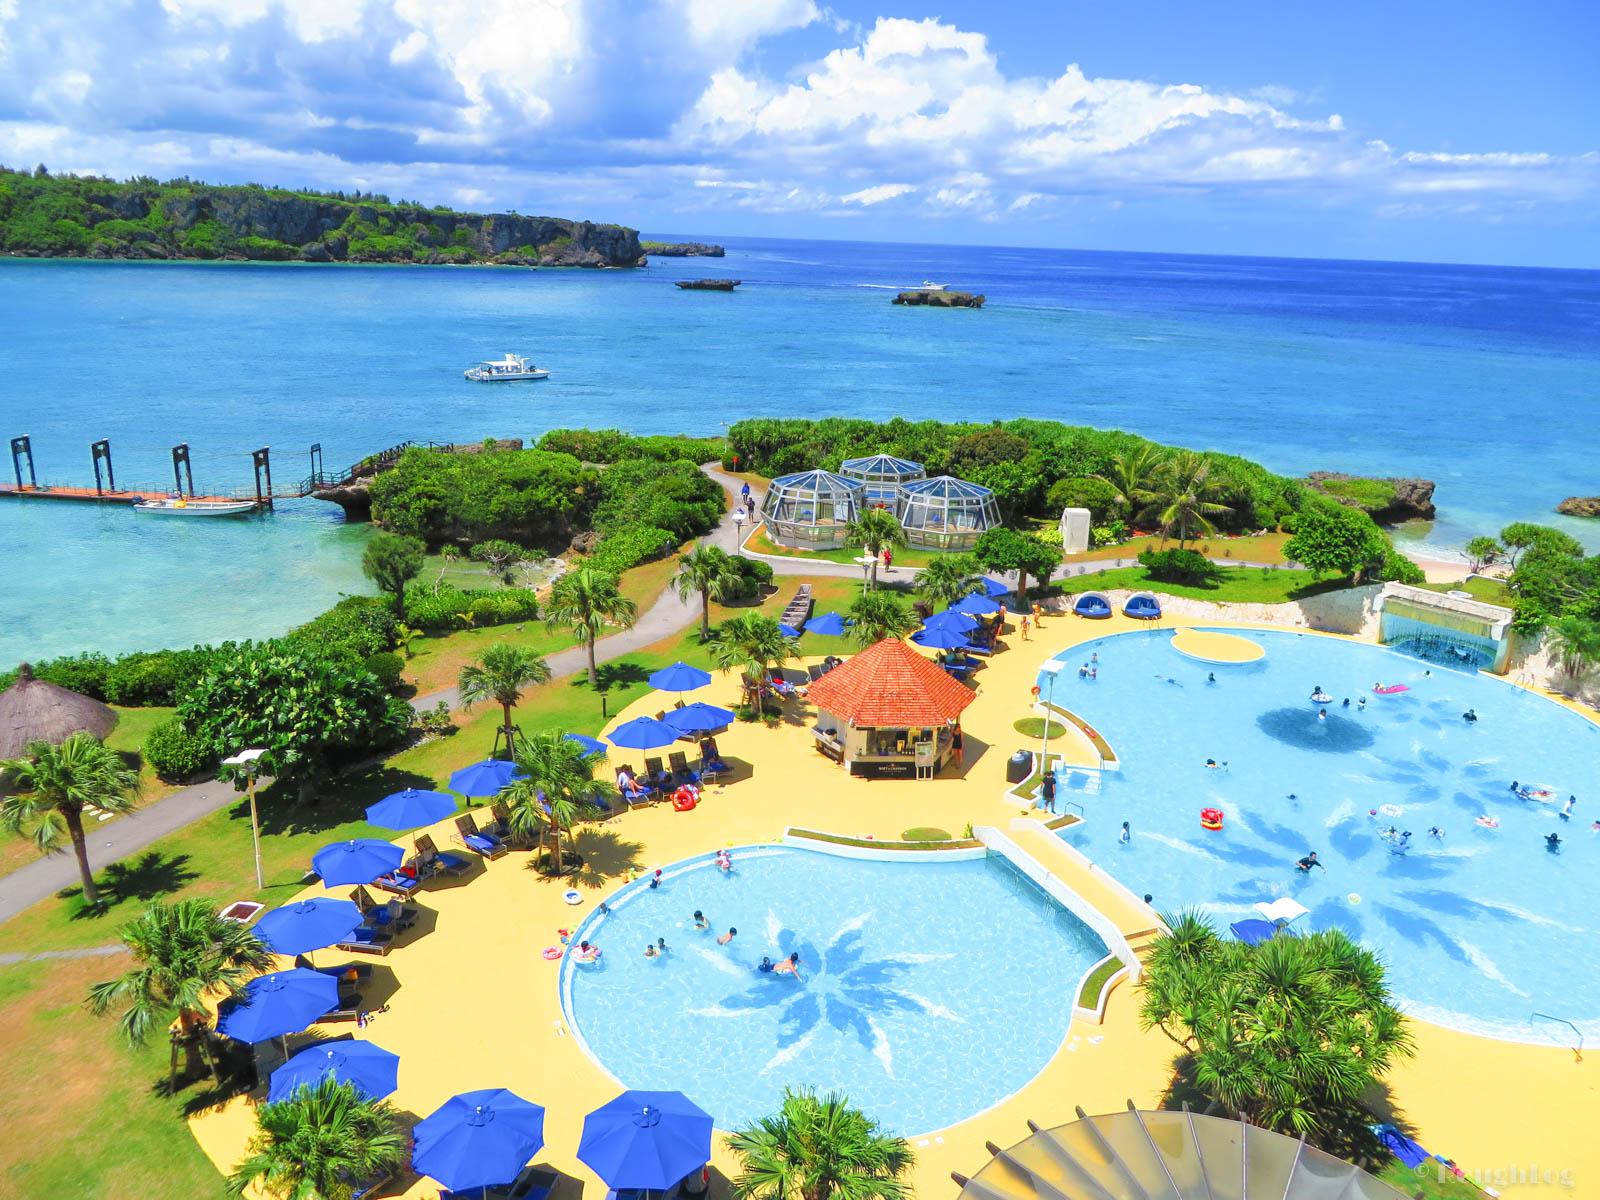 ANAインターコンチネンタル万座ビーチリゾートホテルから眺める沖縄の海